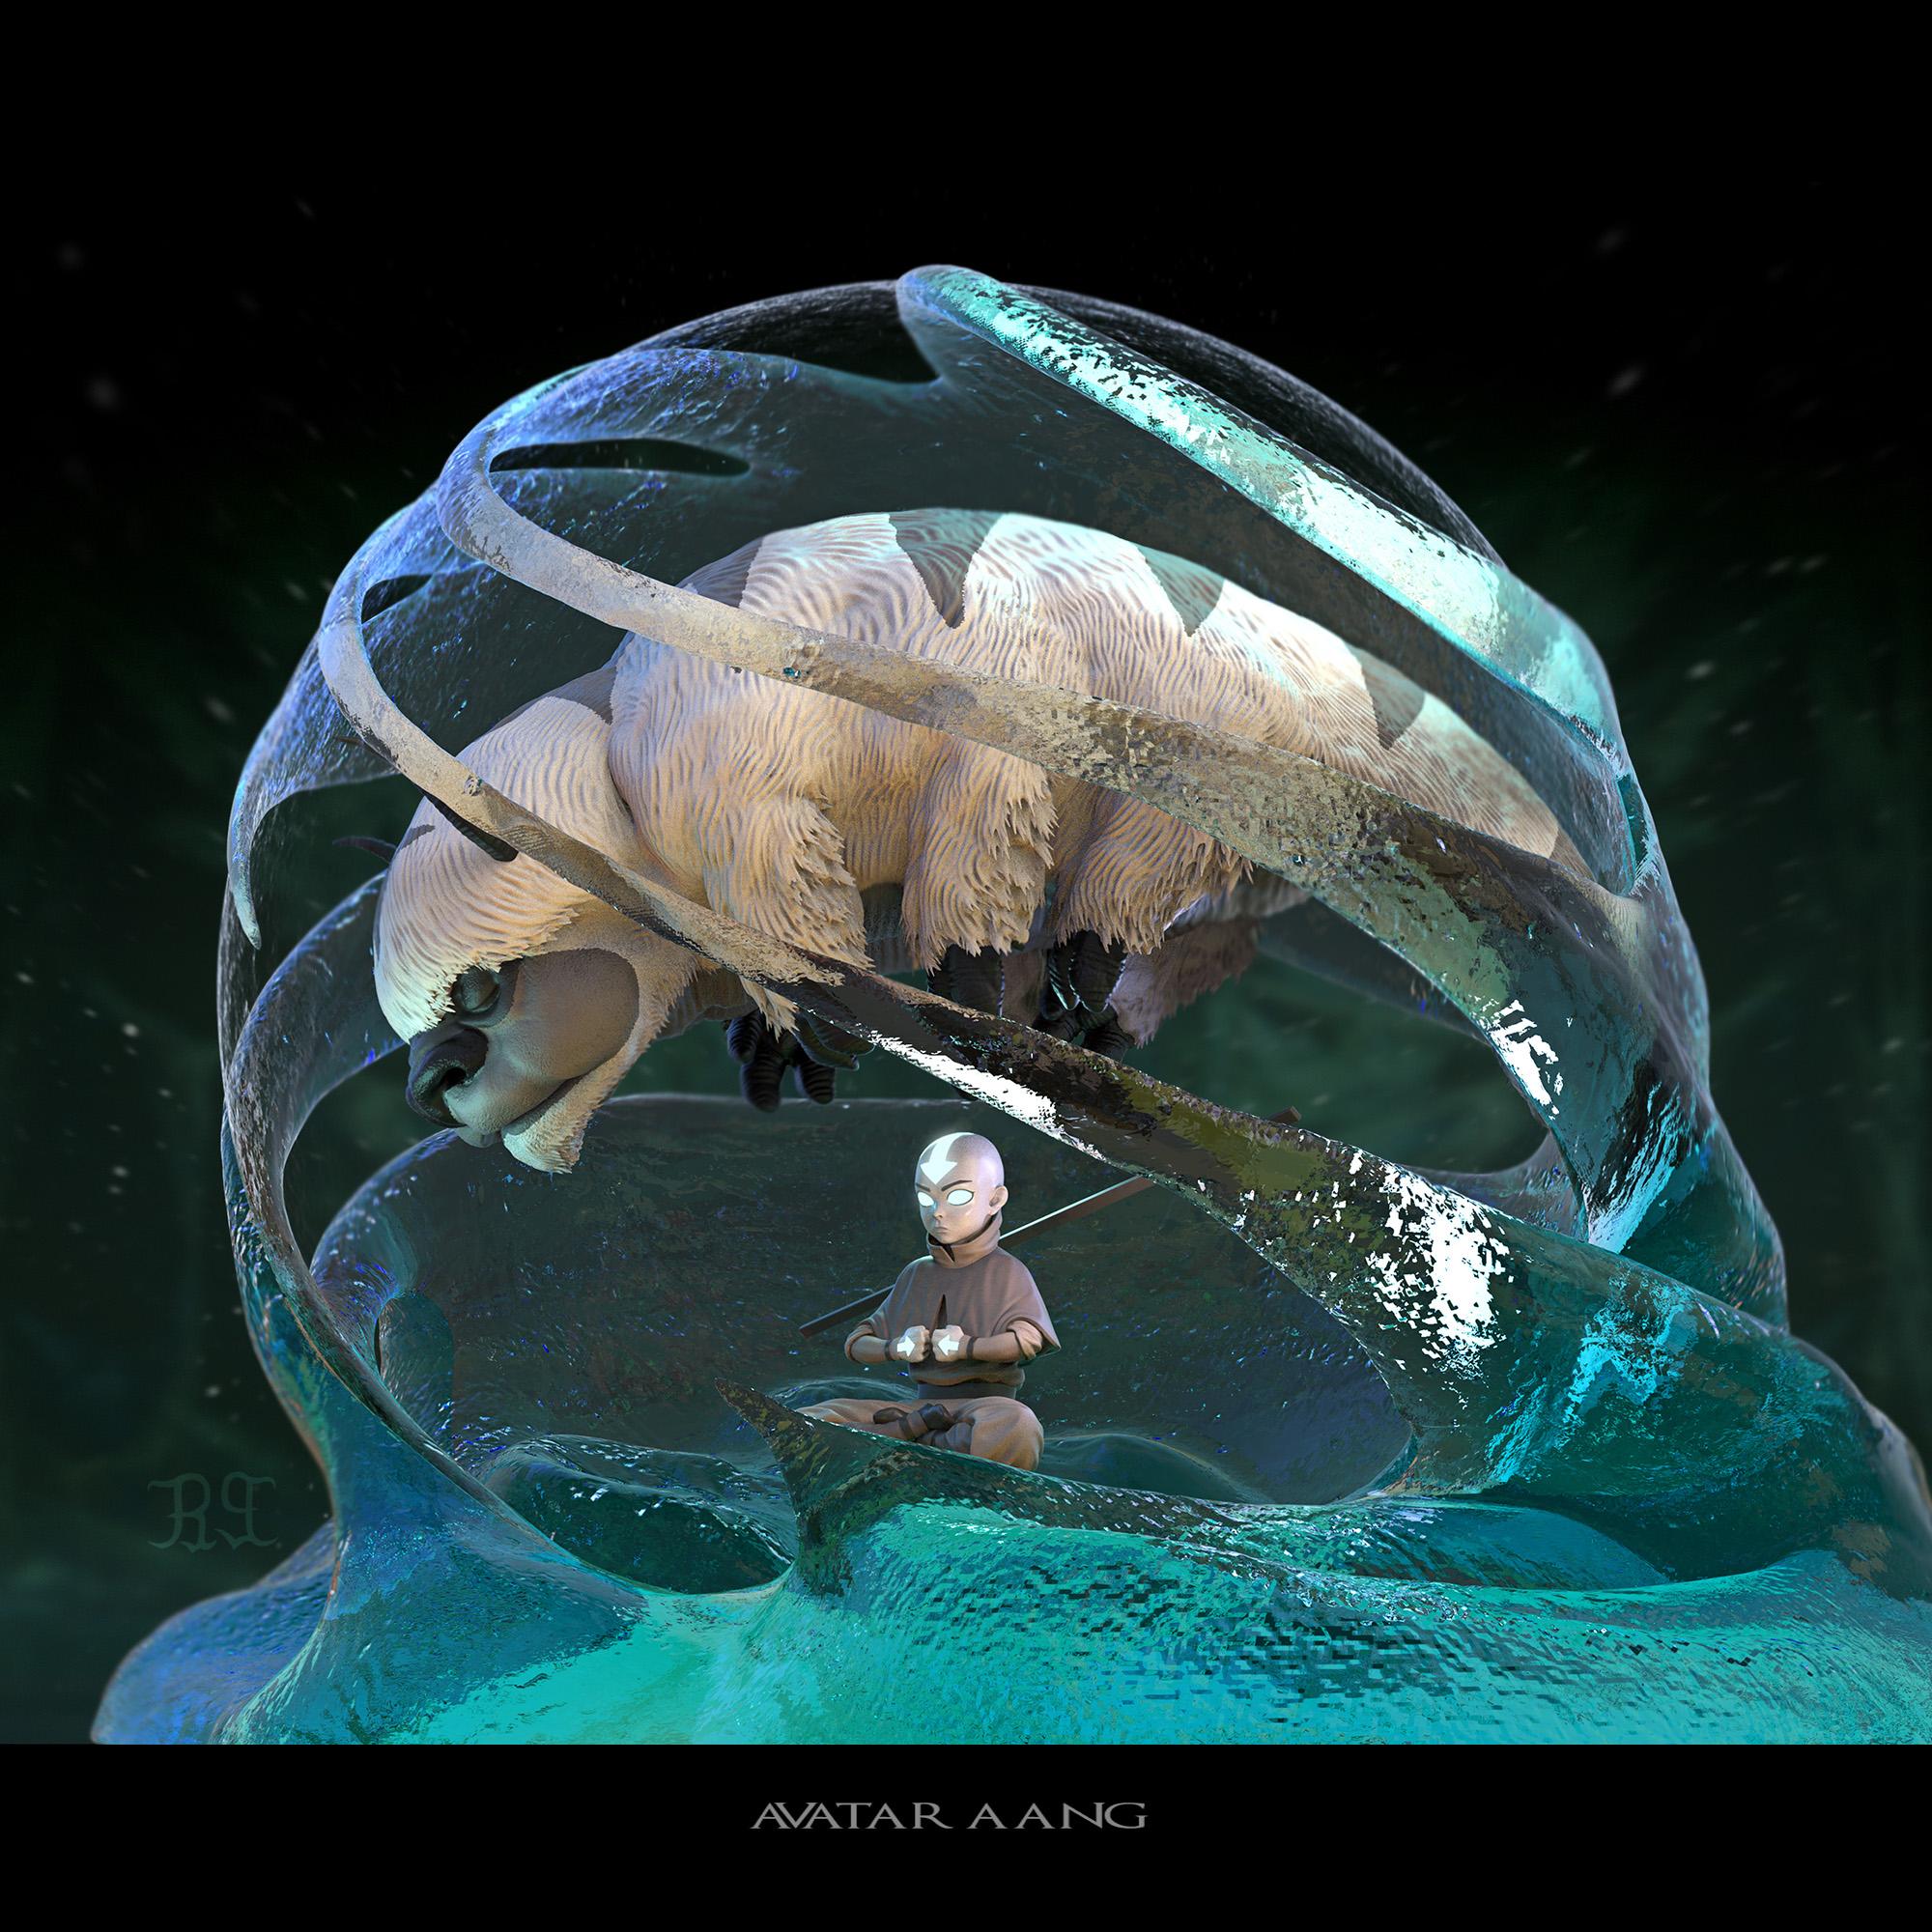 Avatar 2 Date: Avatar Aang. The Last Airbender